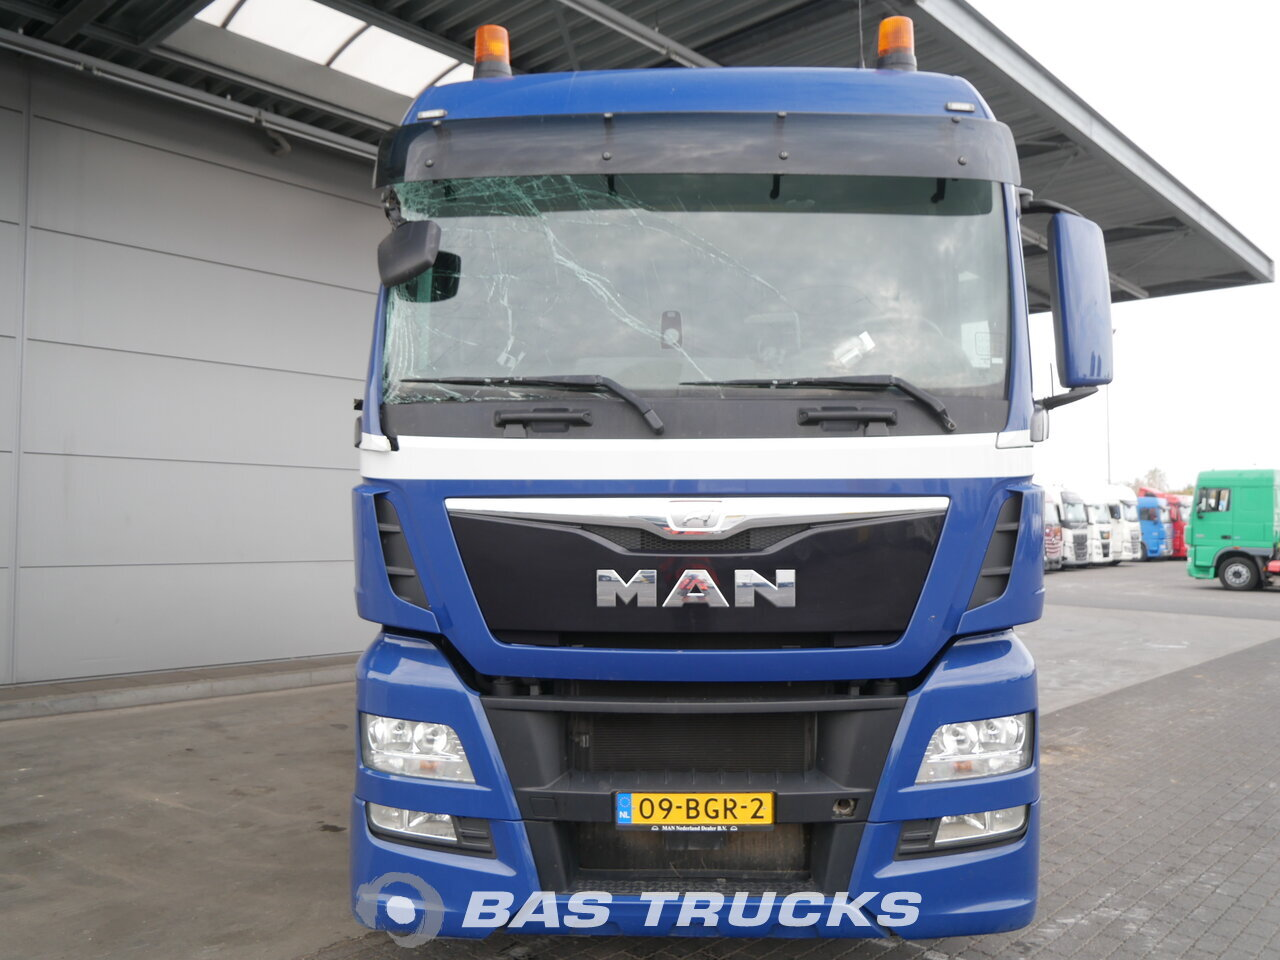 For sale at BAS Trucks: MAN TGX 26 440 XLX Unfall Engine Problem 6X2 12/2015